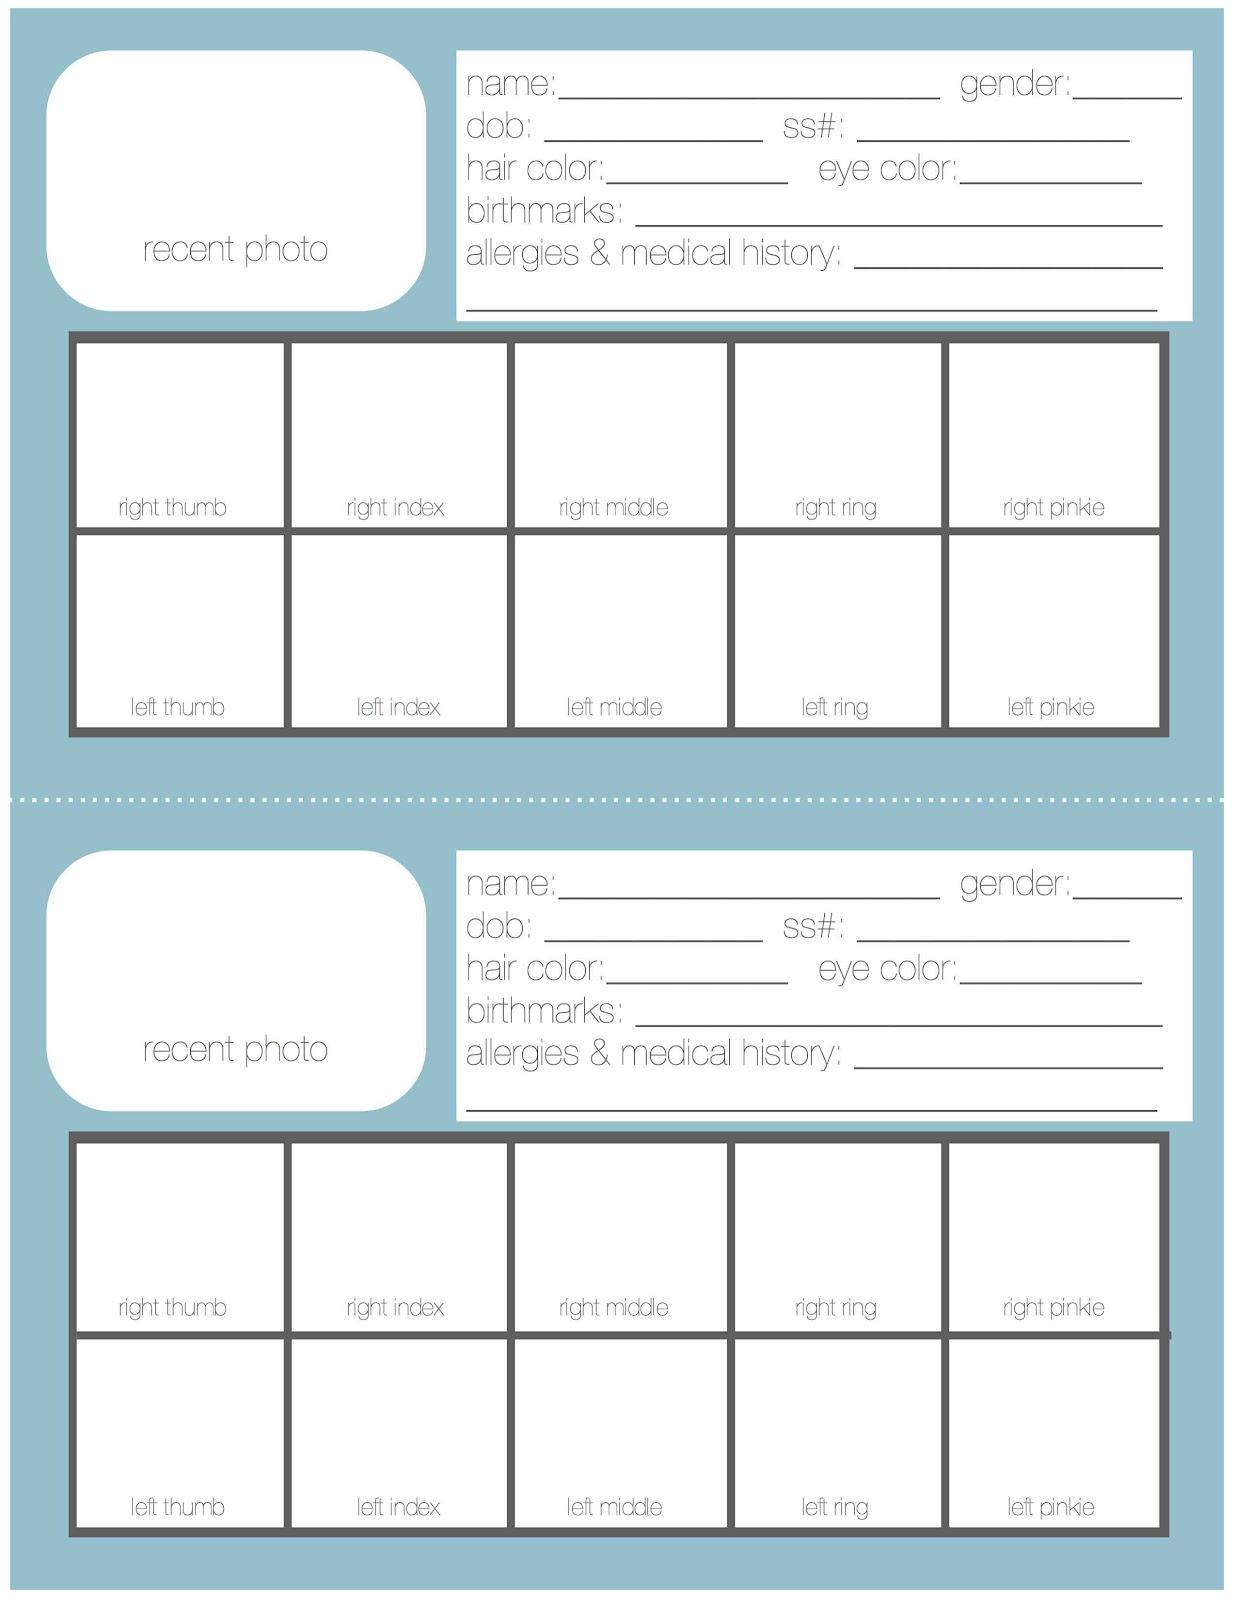 Just Sweet And Simple: Emergency Binder: Free Printables - Free Printable Customer Information Sheets